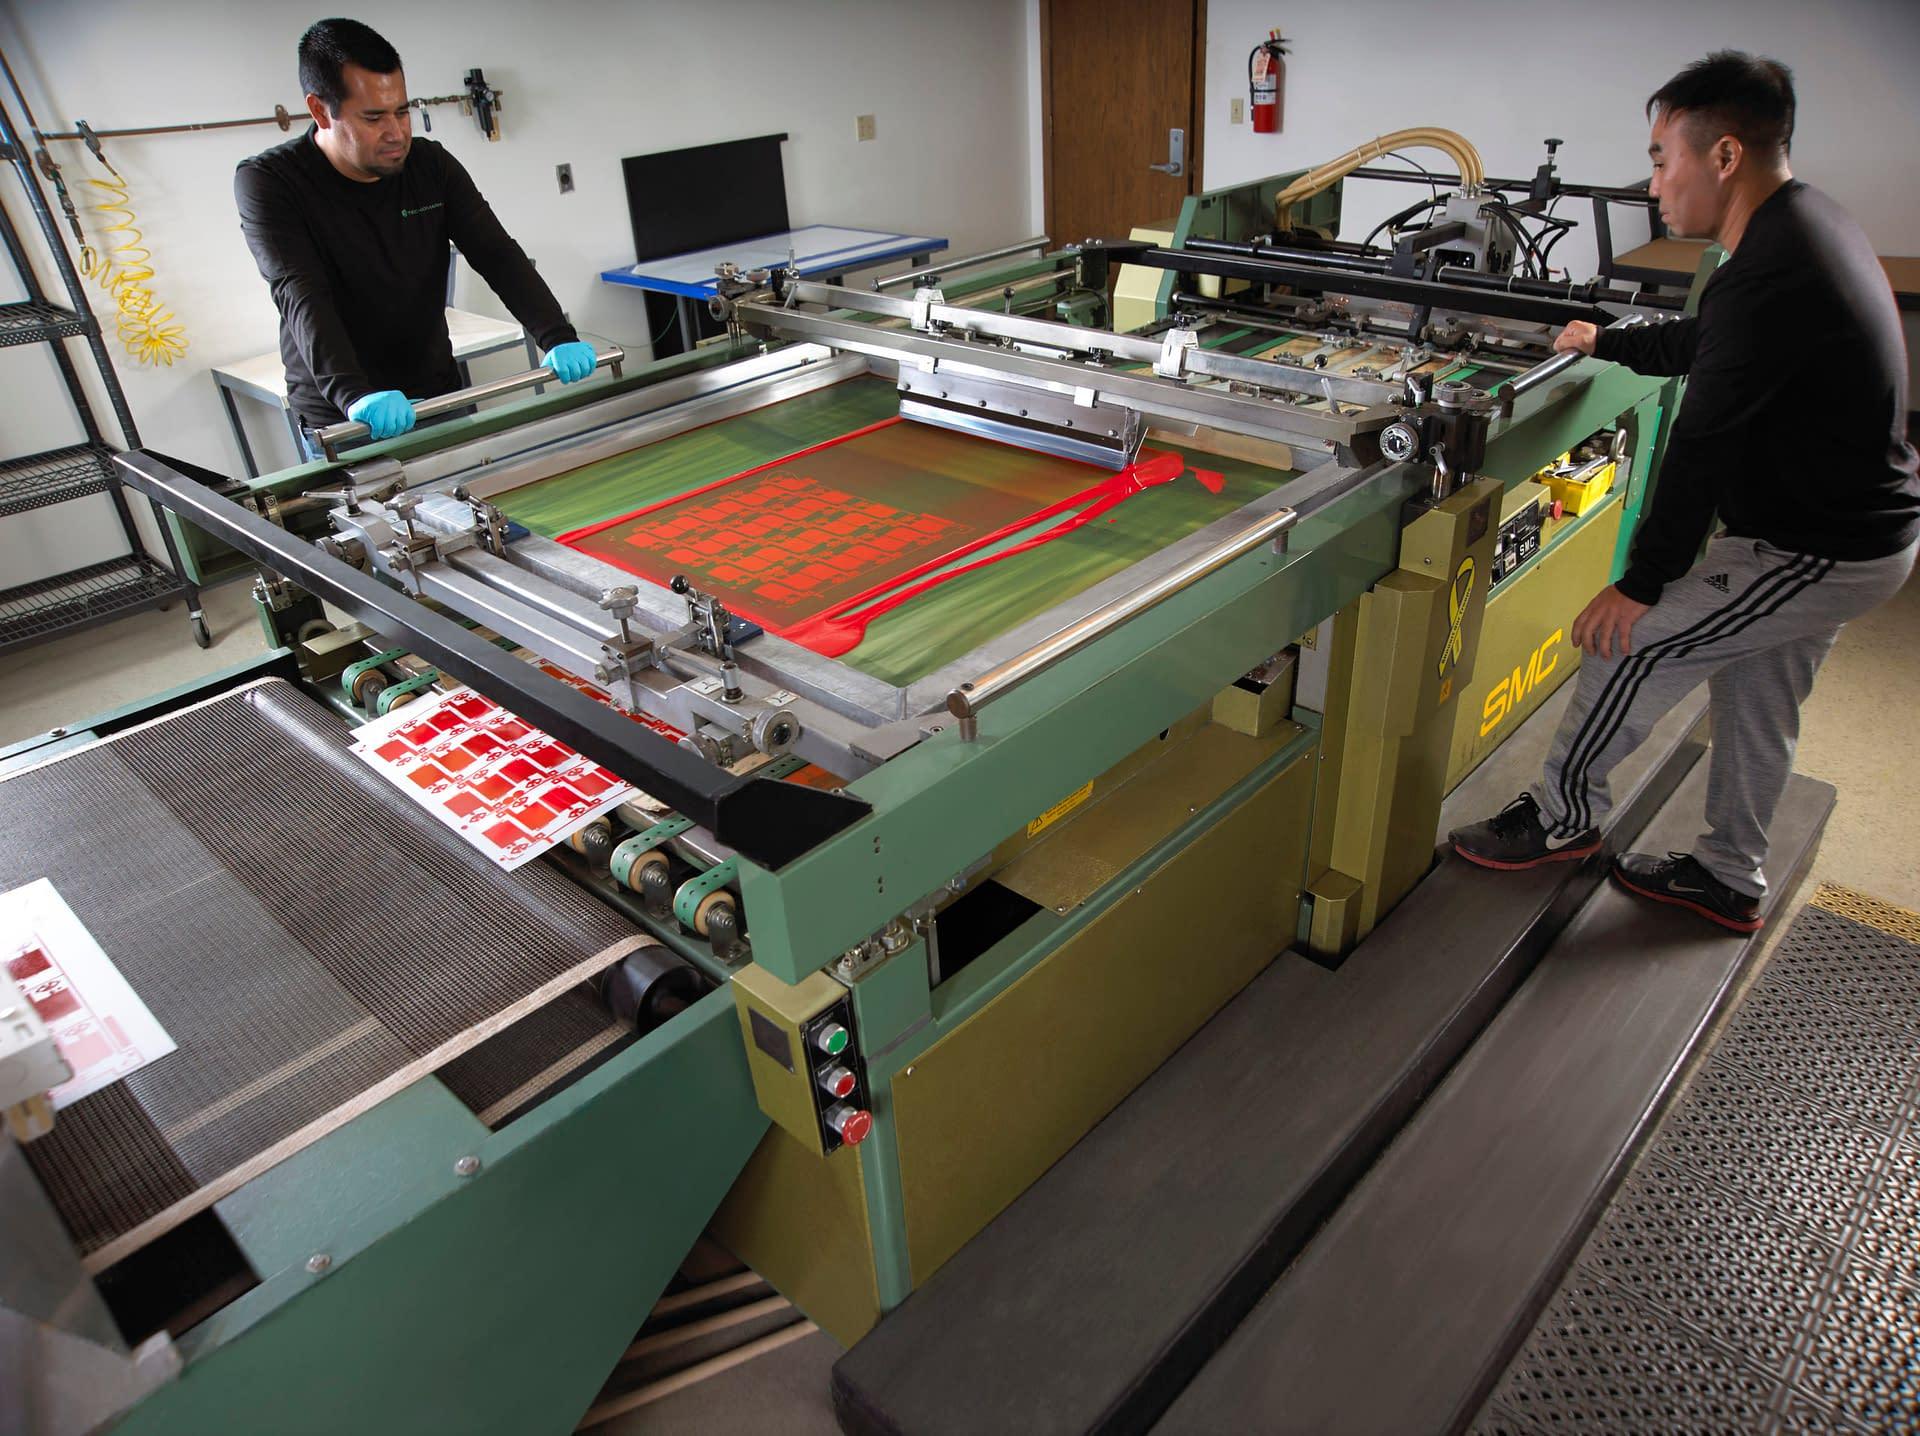 Technicians operating high speed silkscreen machine printing component overlays